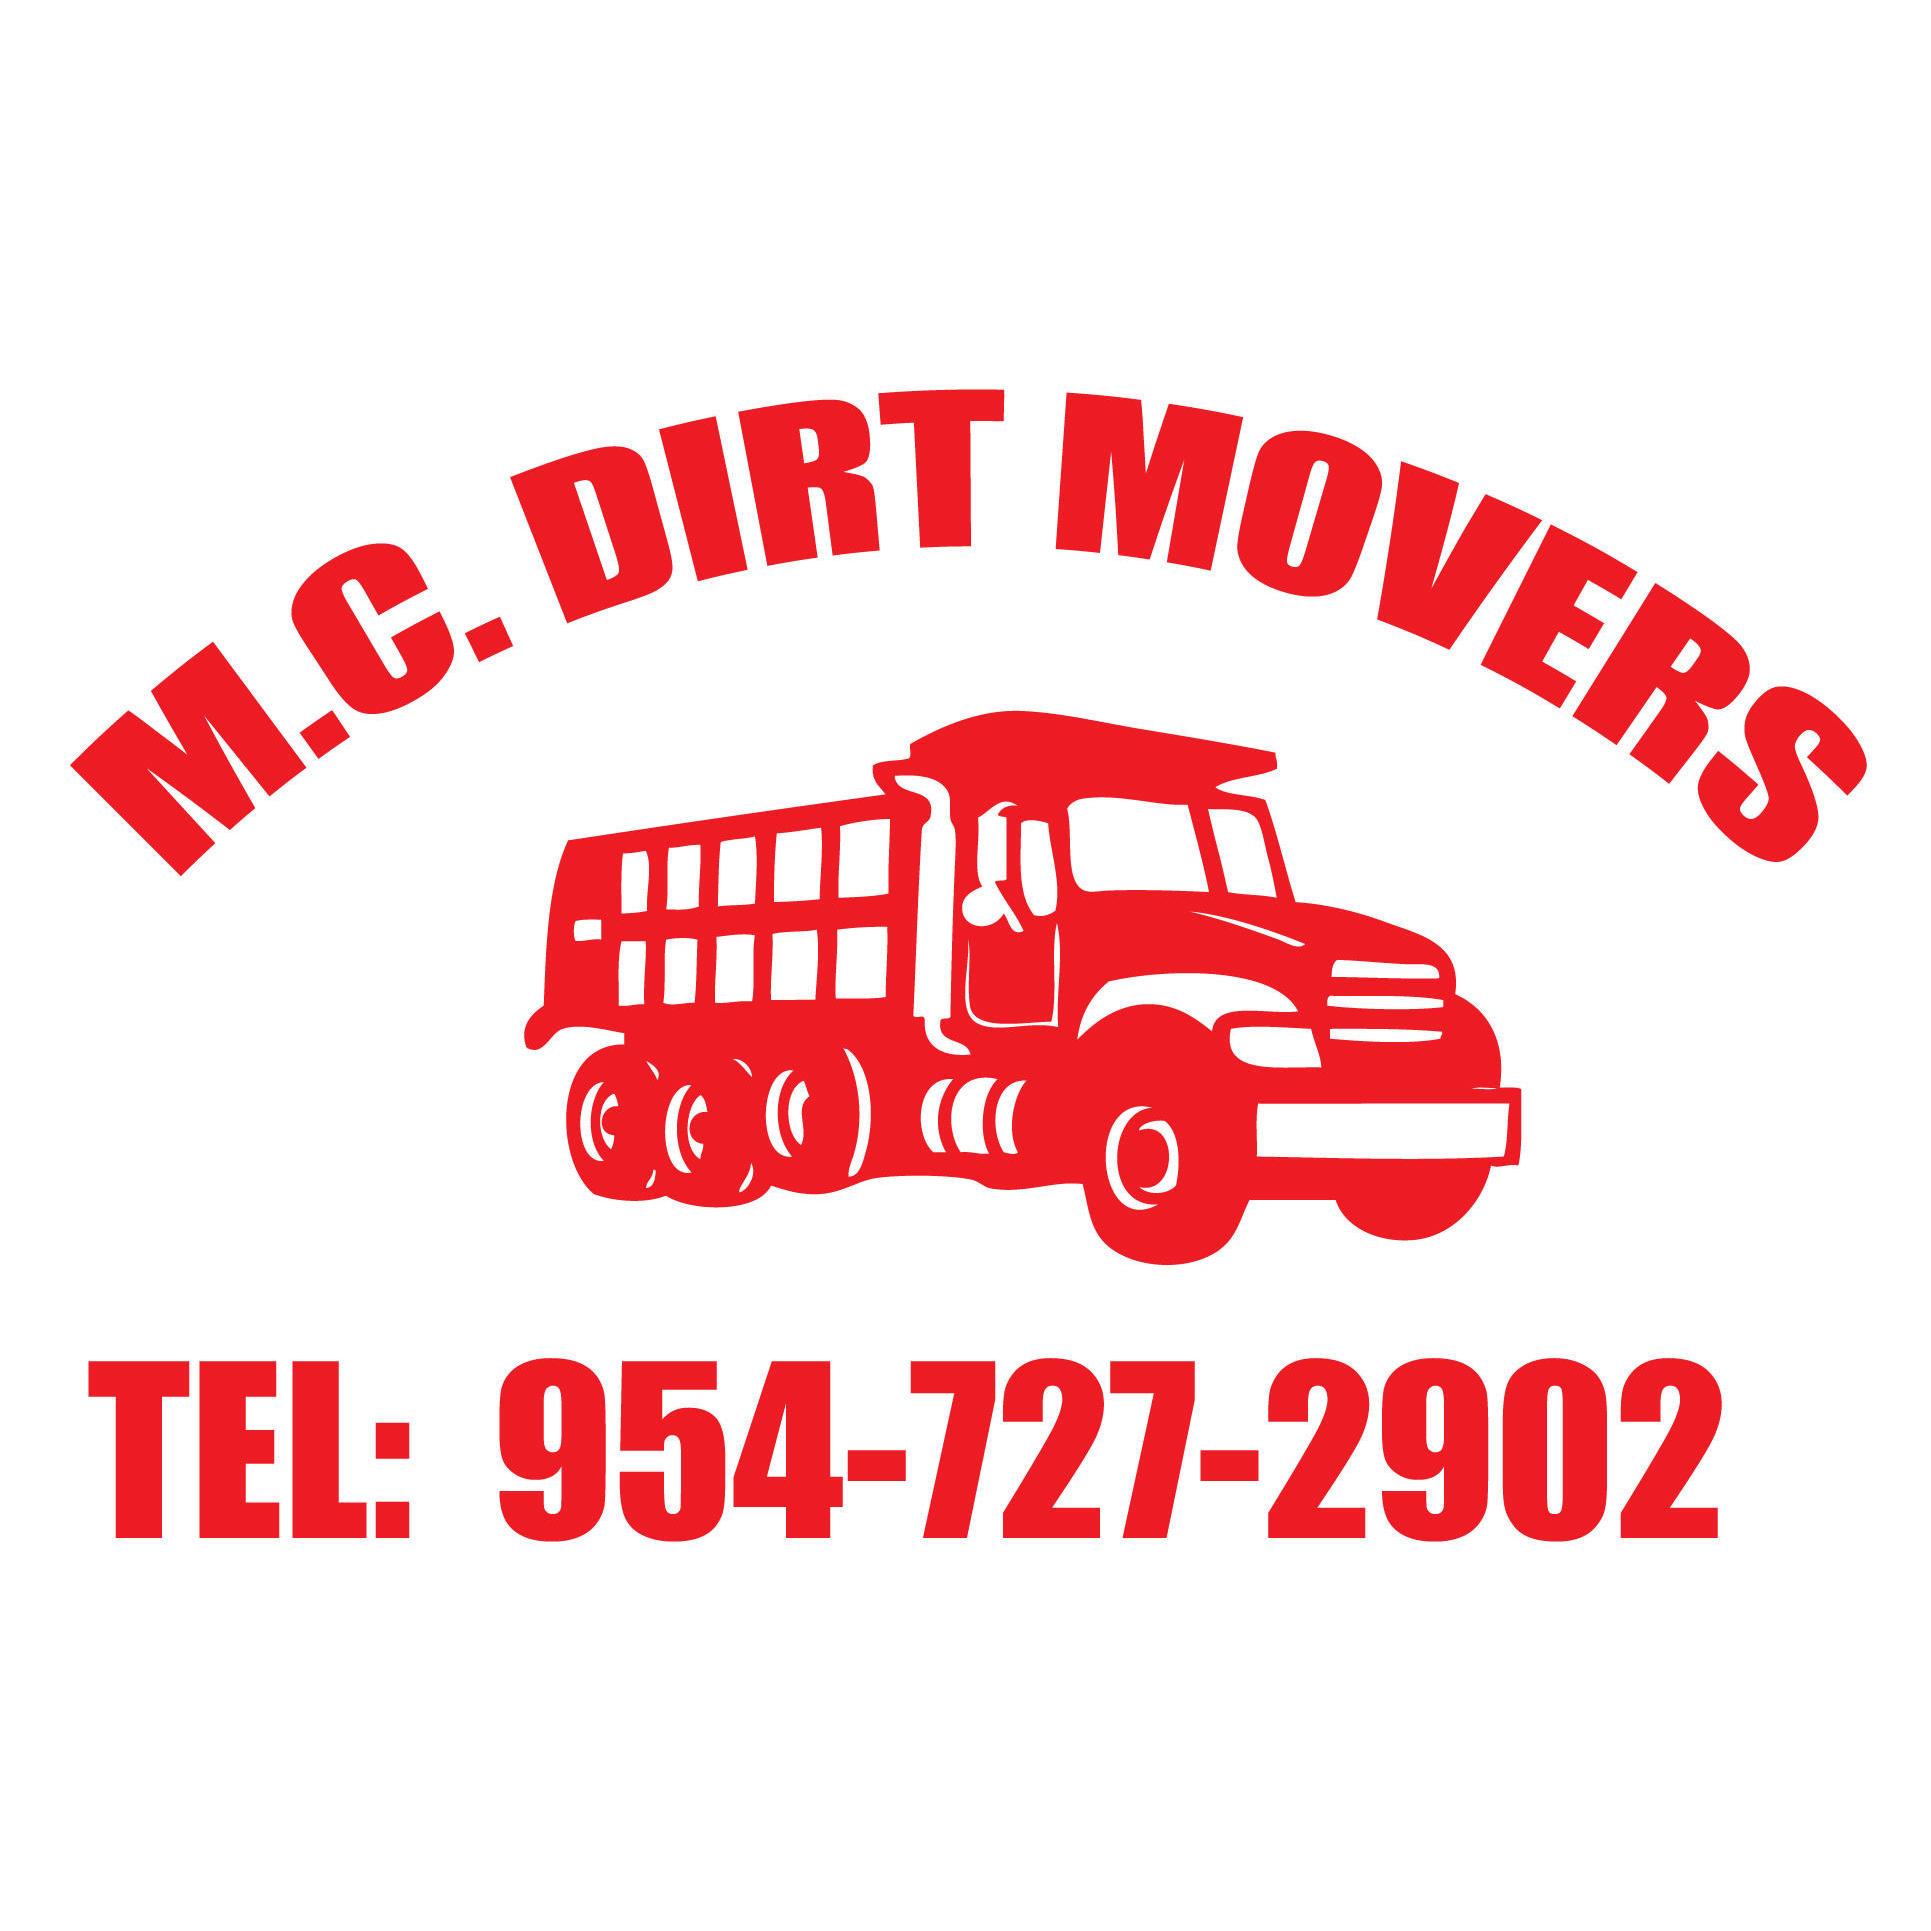 M.C. Dirt Movers Inc. image 1